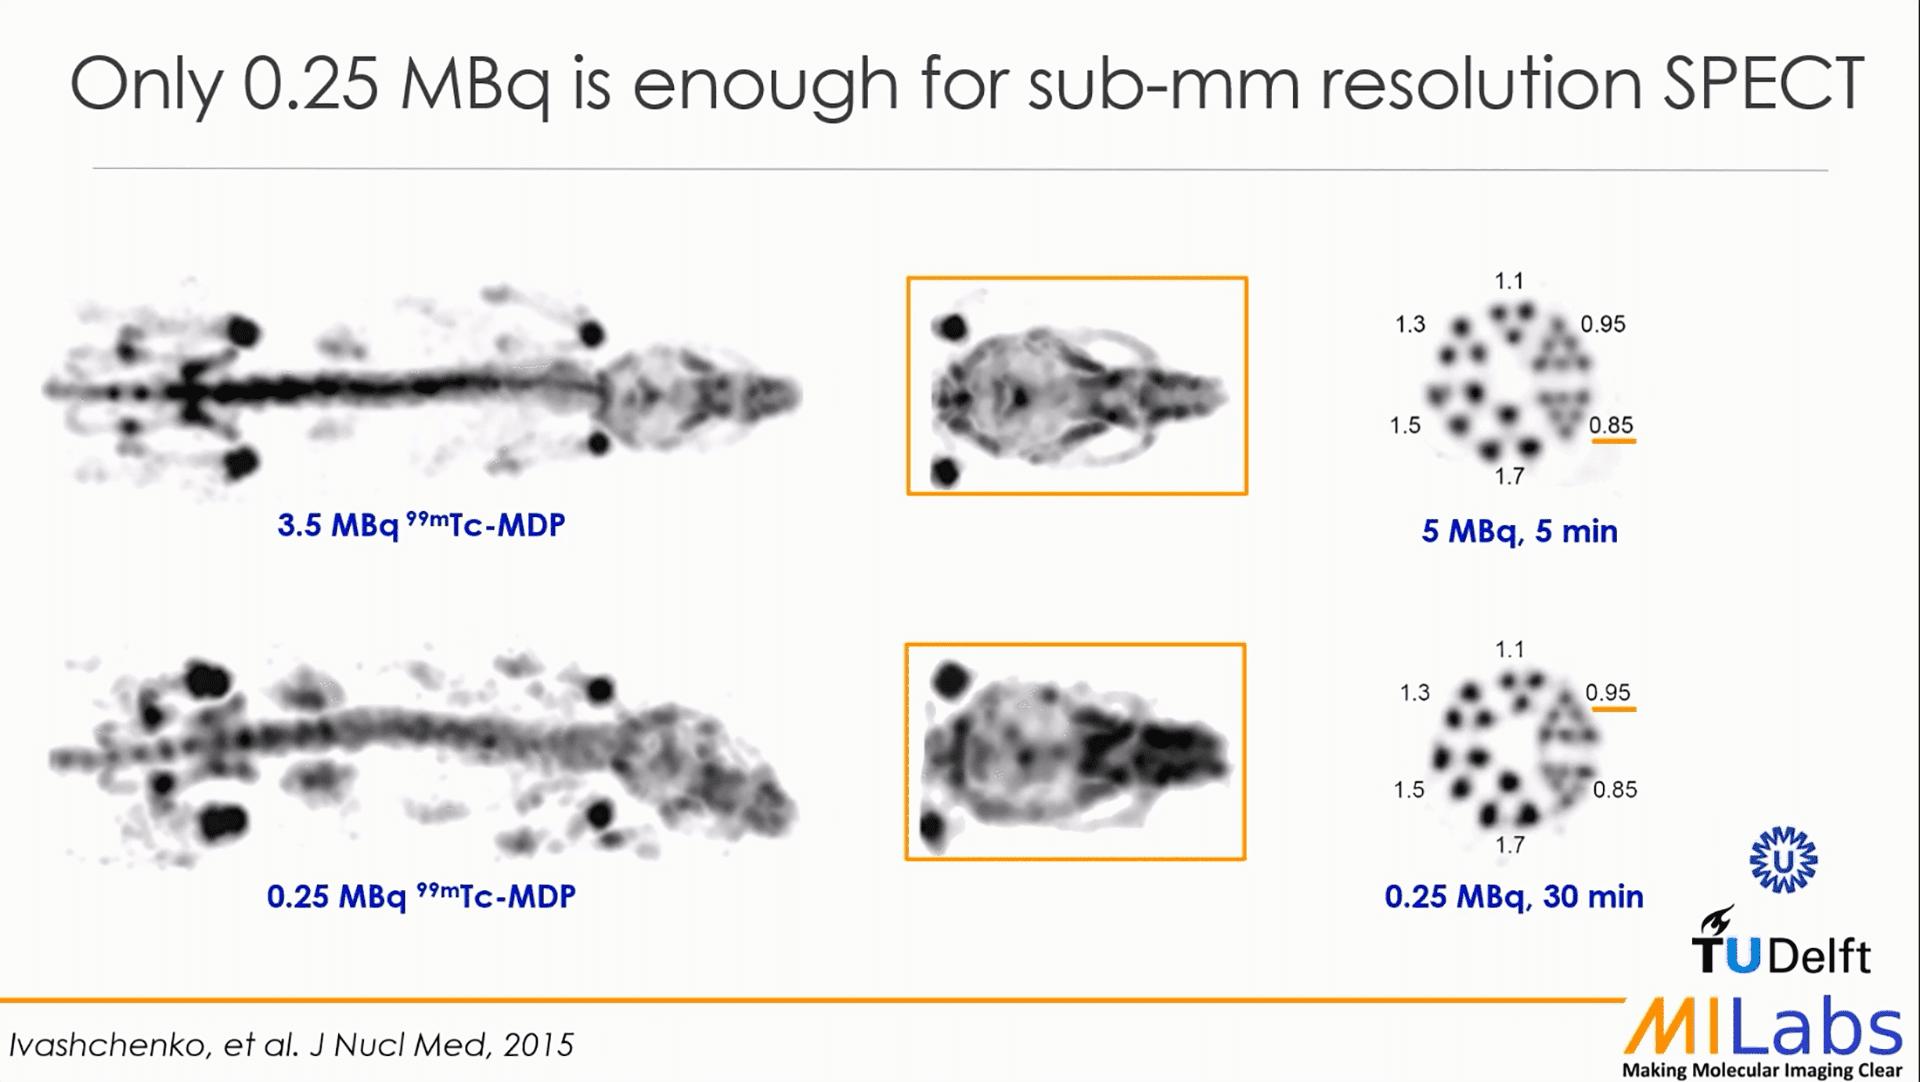 low dose sub-mm resolution microSPECT